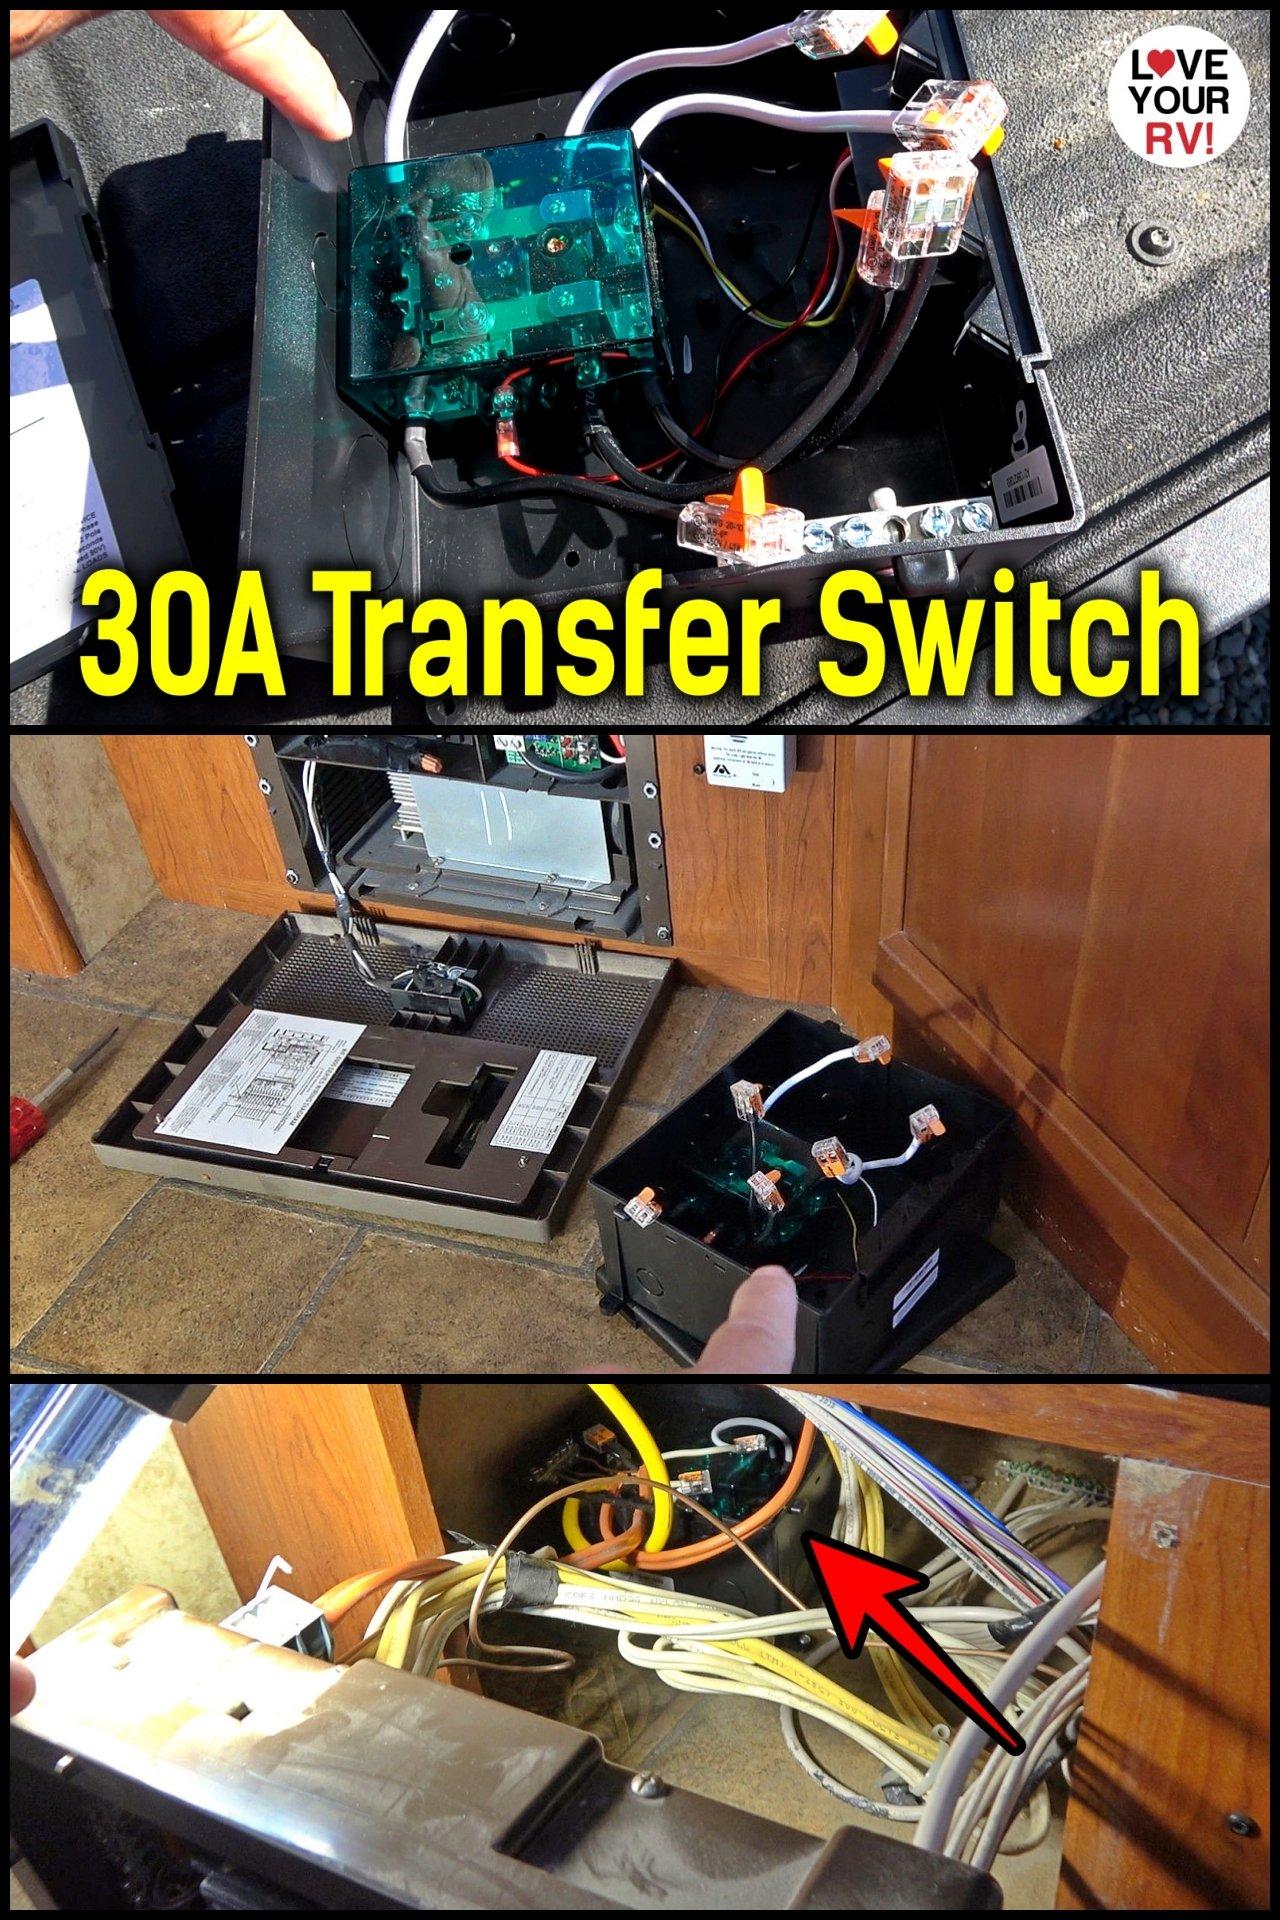 Go Power 30 Amp RV Transfer Switch Installation